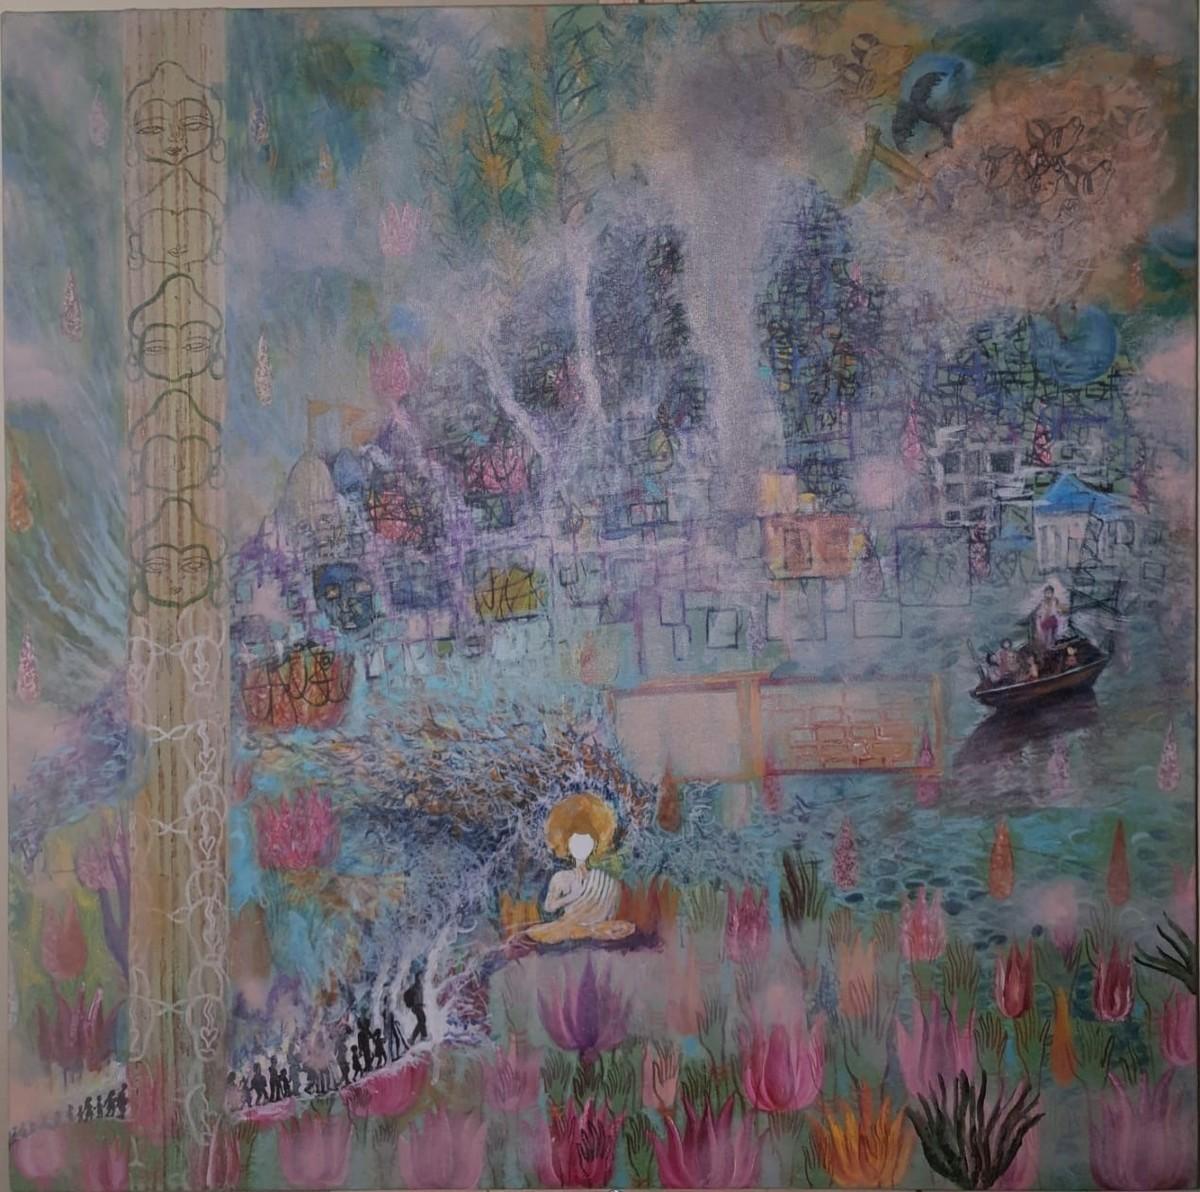 Untitled by Manisha Pandey Mishra, Impressionism Painting, Mixed Media, Salt Box color